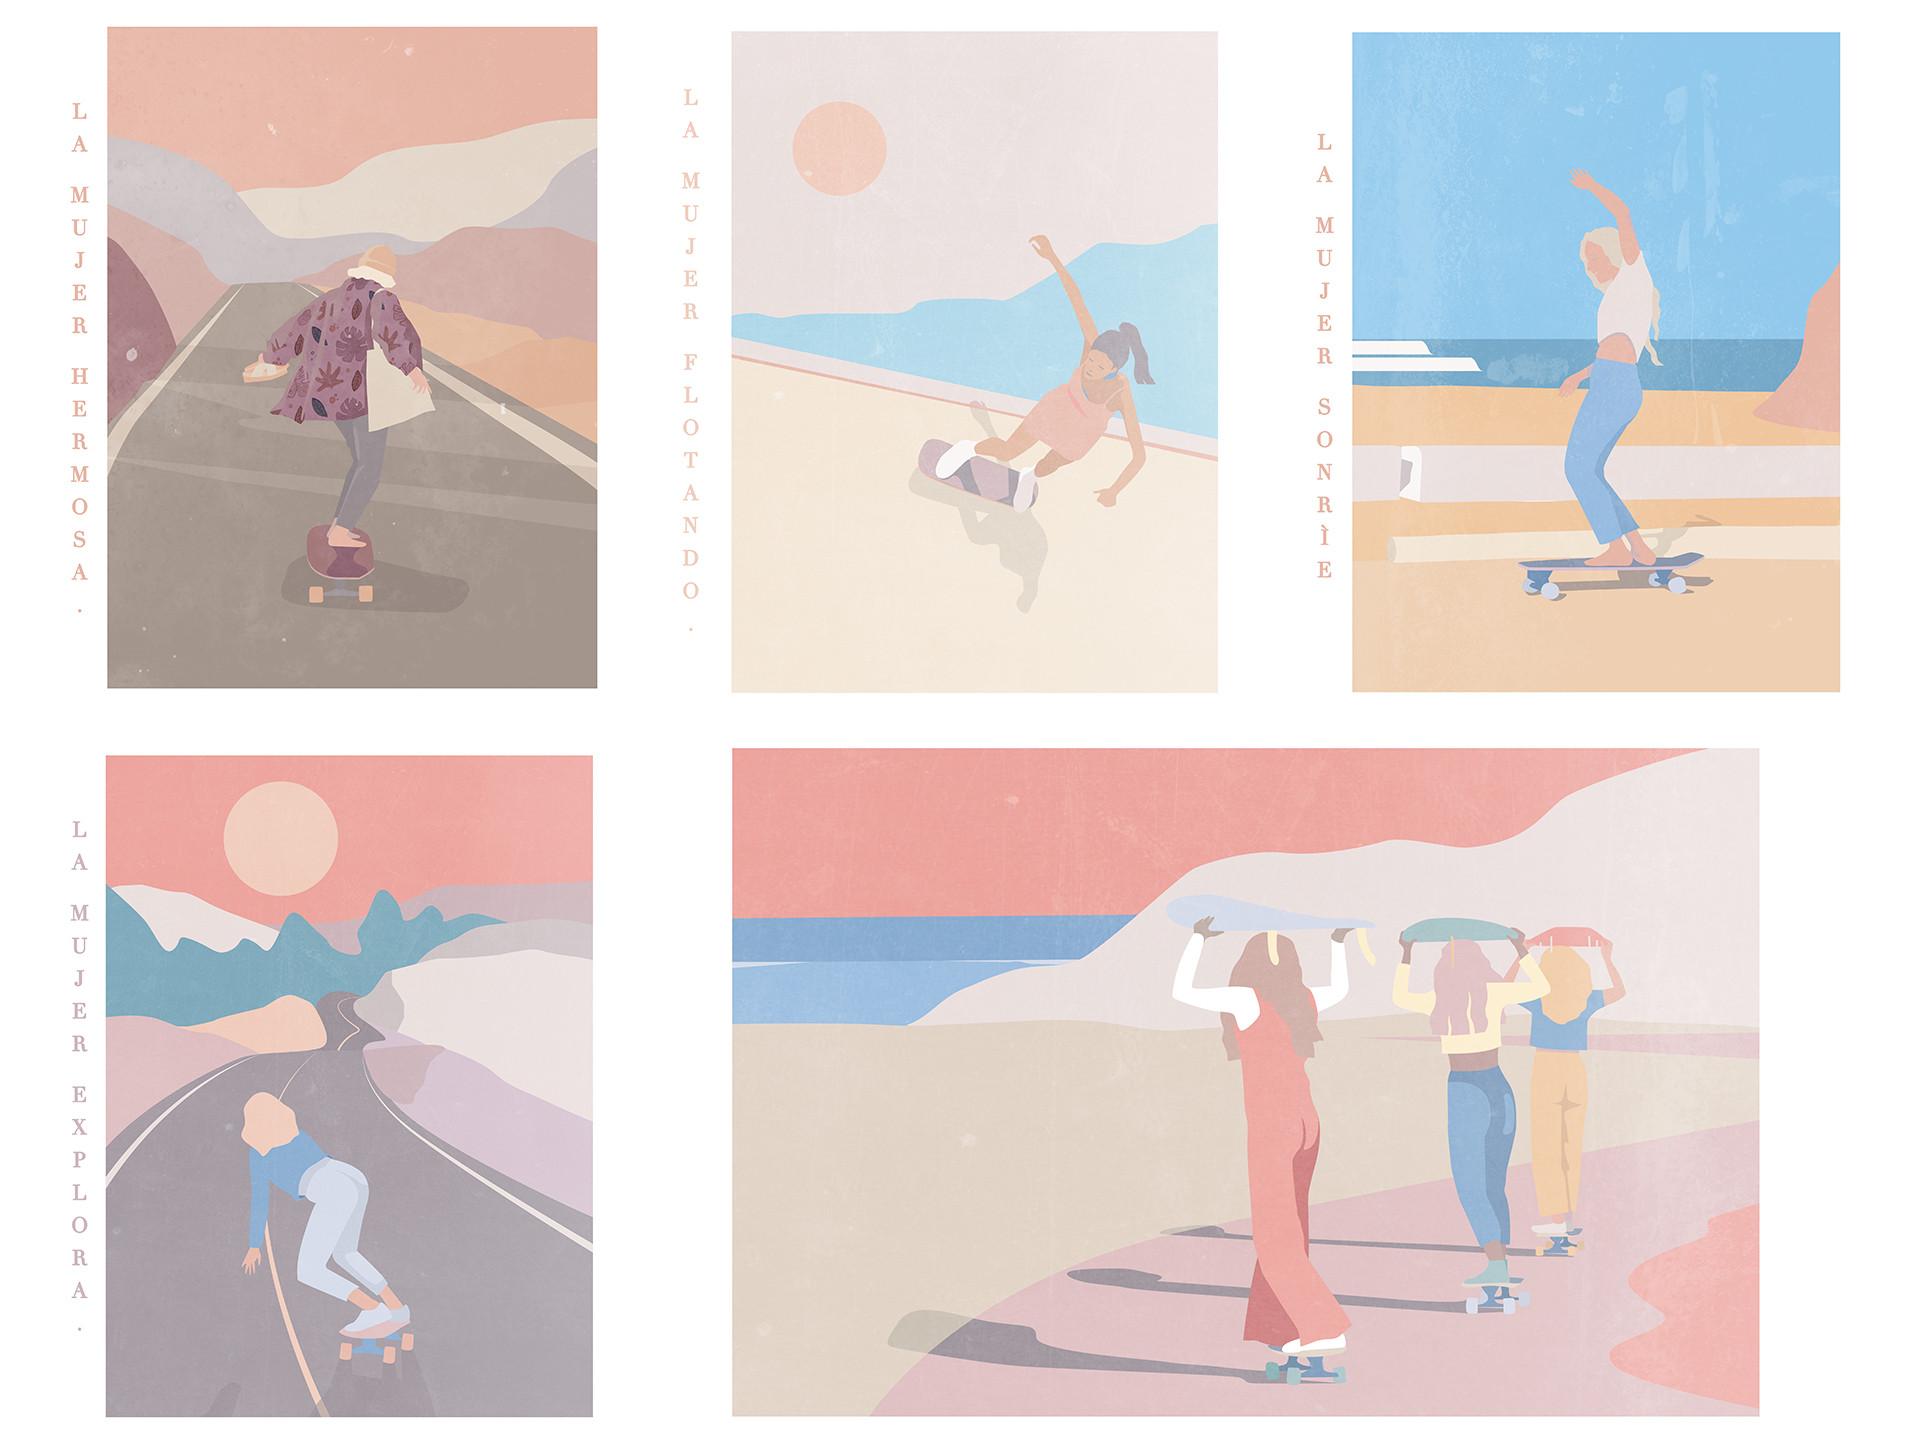 lasmujeres skate.jpg